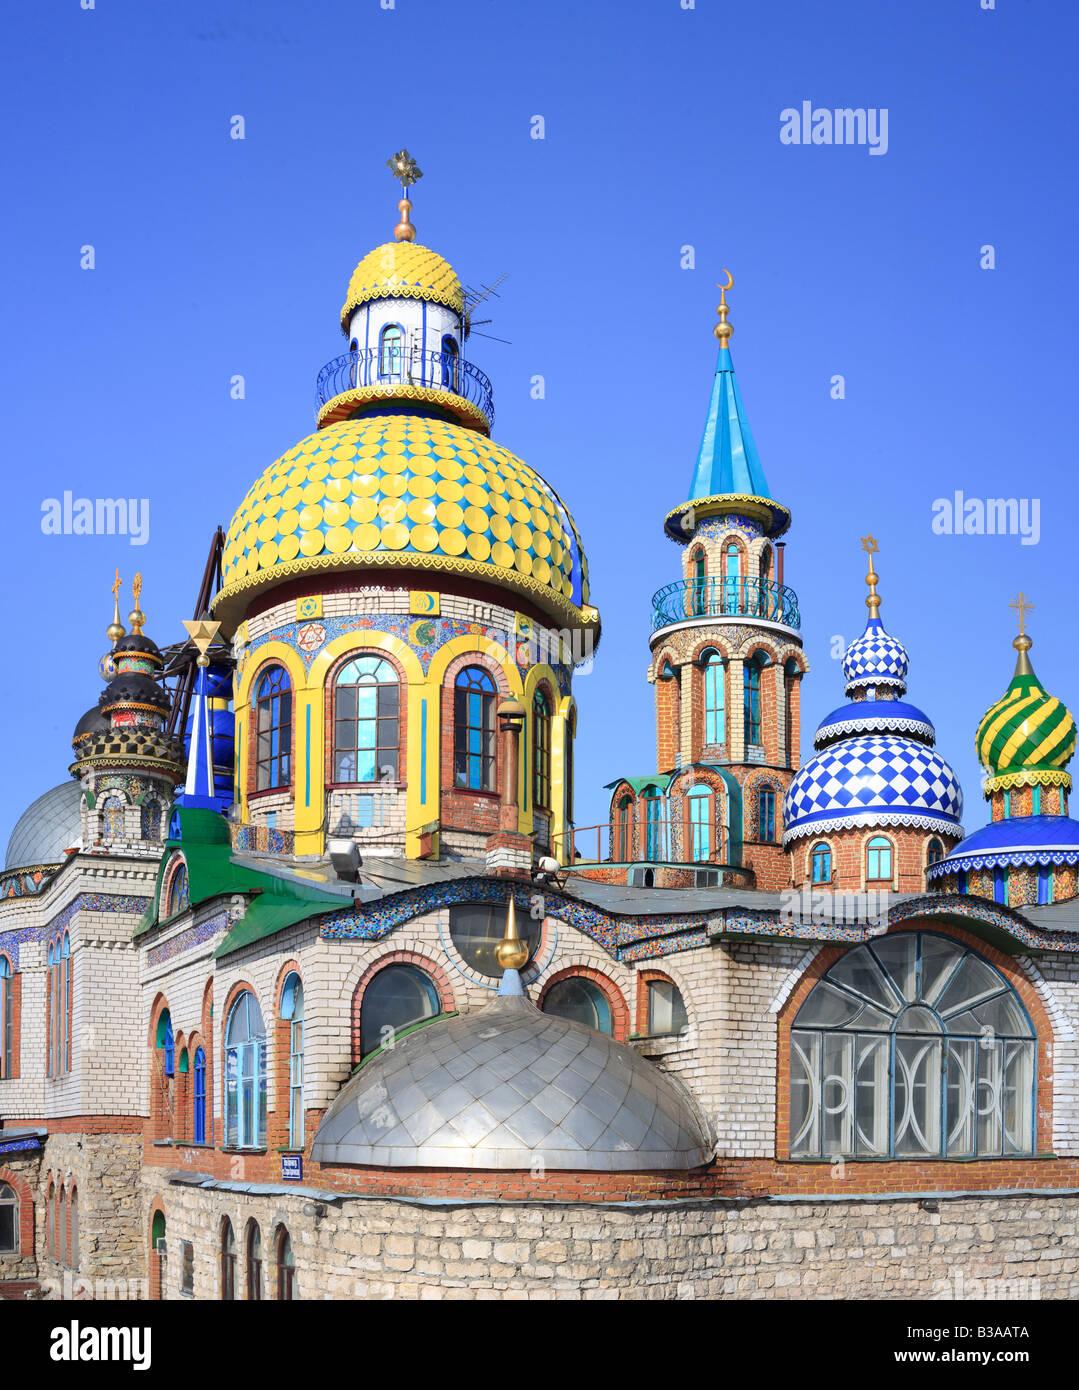 "'Temple de toutes les religions"", l'architecture moderne, Kazan, Tatarstan, Russie Photo Stock"